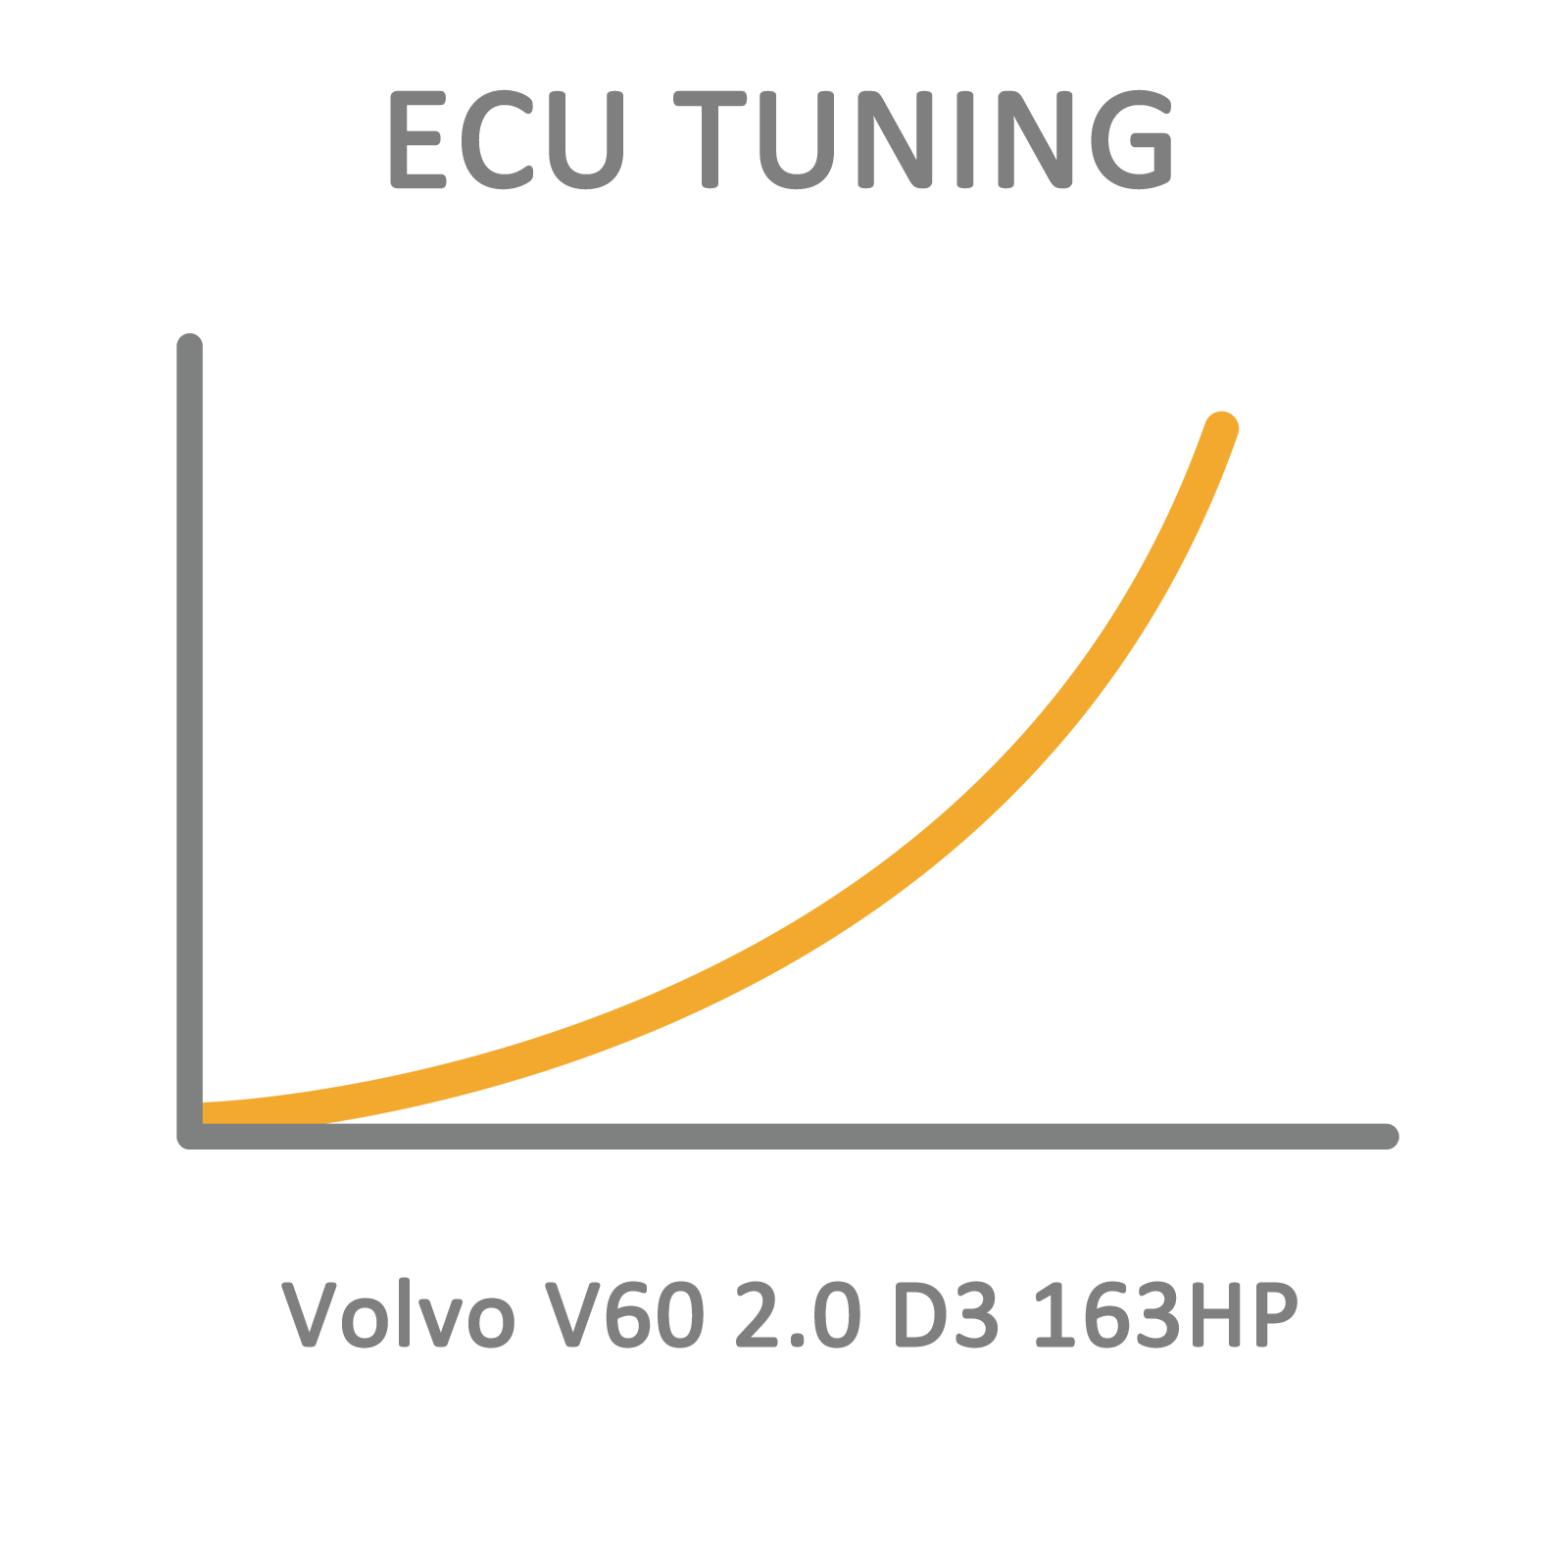 Volvo V60 2.0 D3 163HP ECU Tuning Remapping Programming